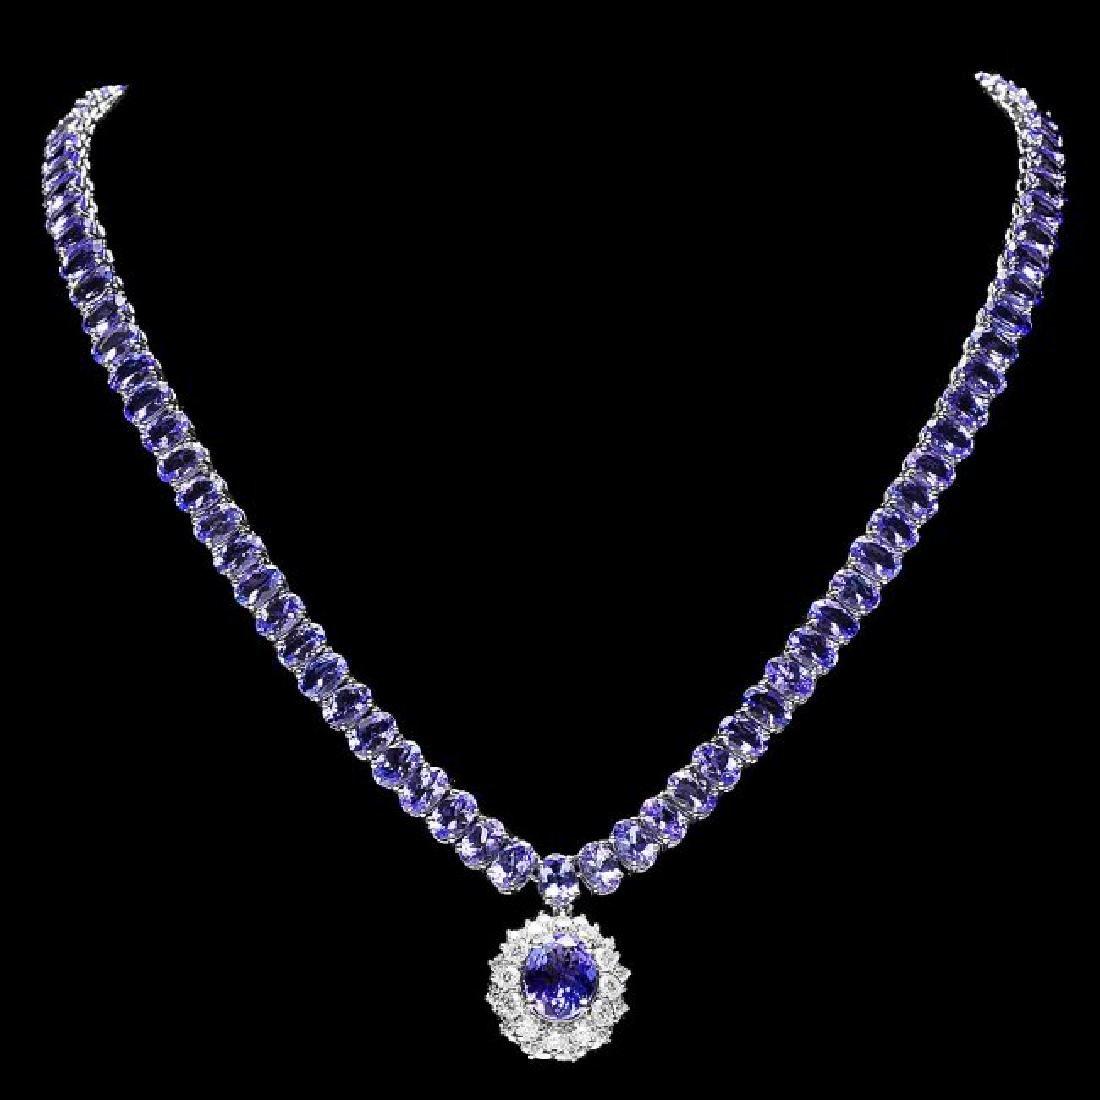 14k 45.25ct Tanzanite 1.35ct Diamond Necklace